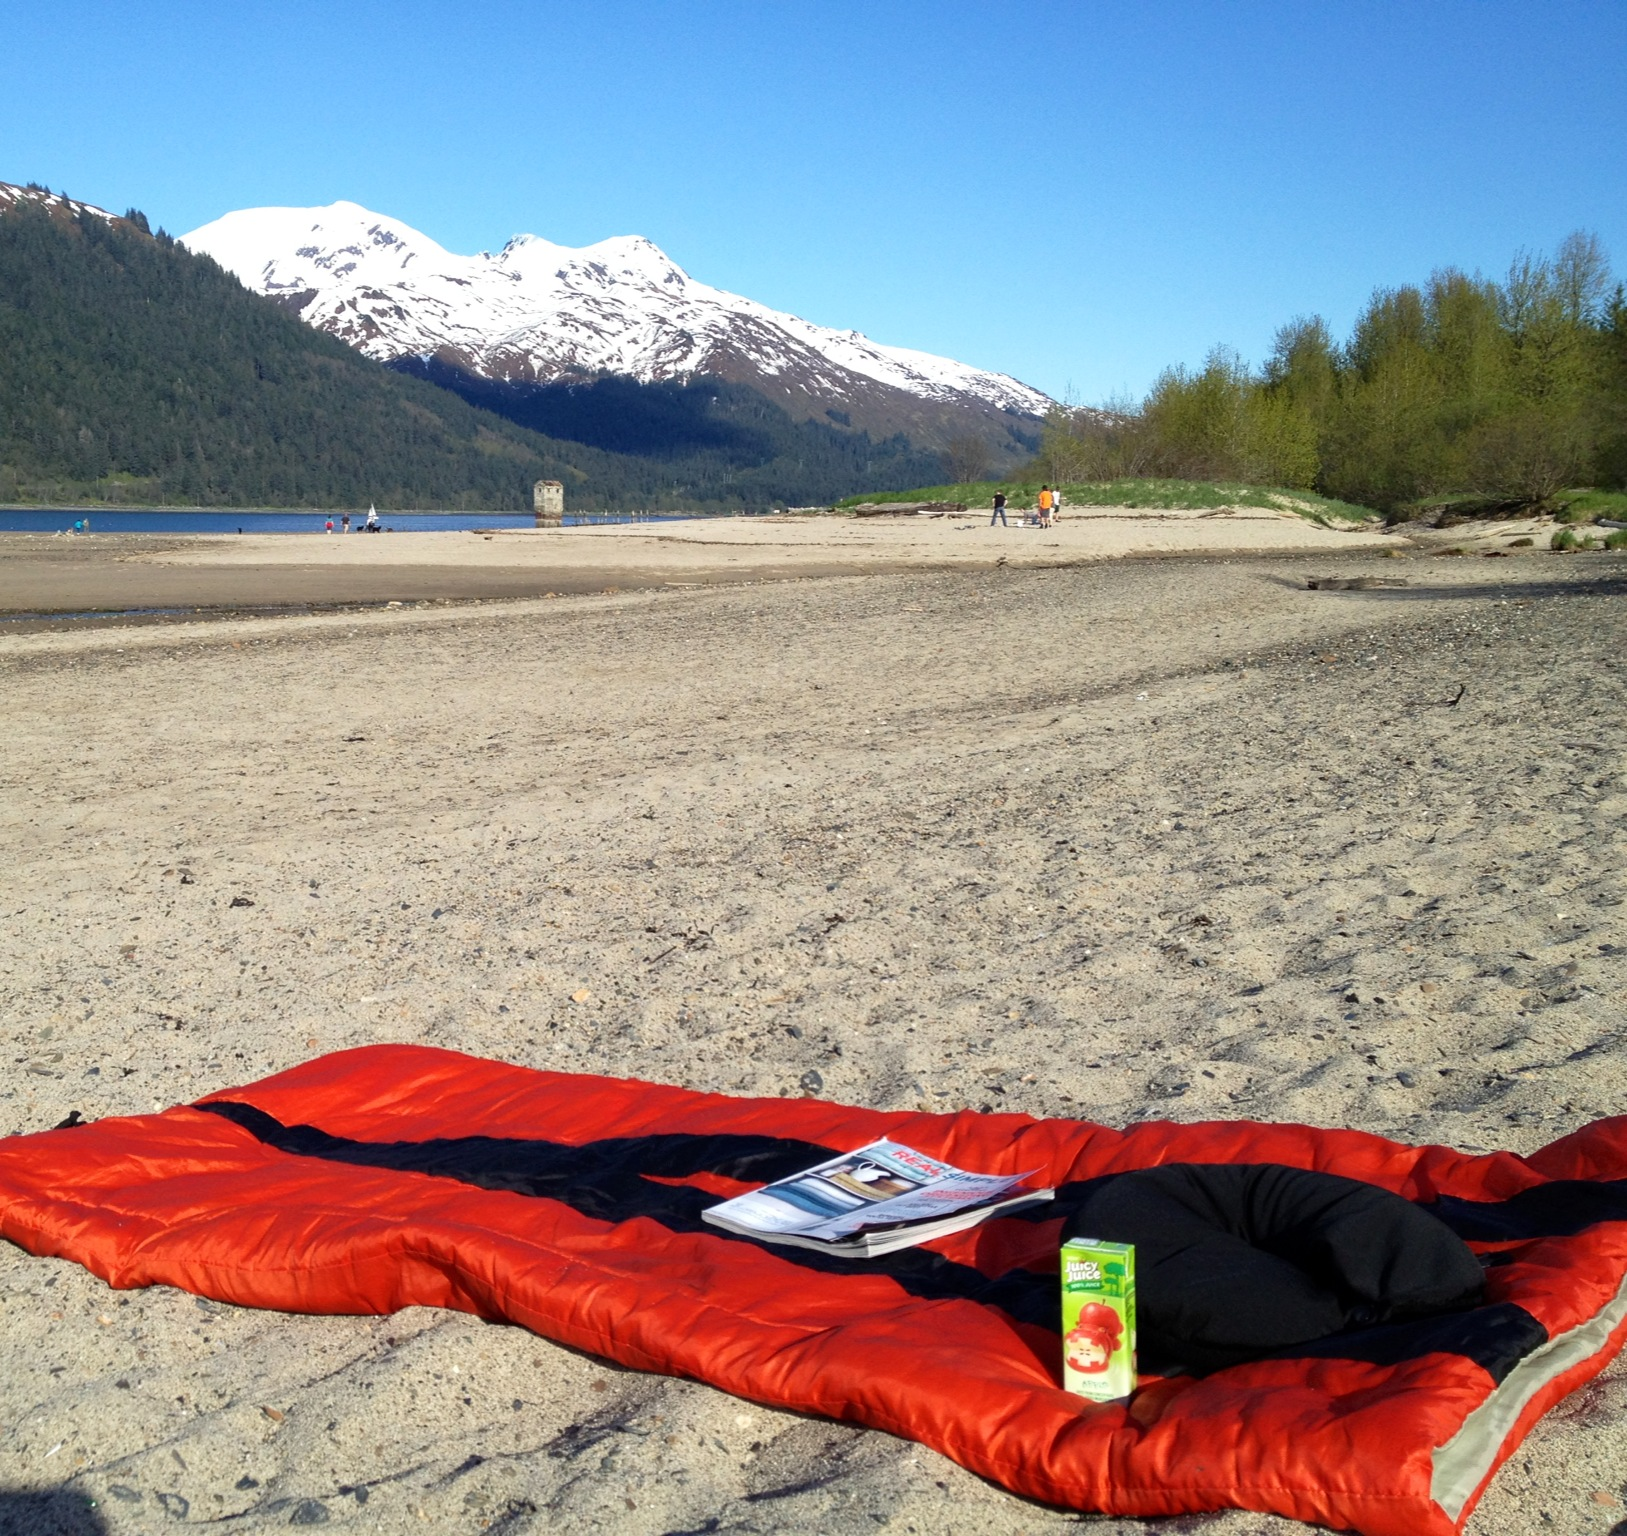 After work R&R with a sleeping bag, juice box, and sun, sun, SUN!